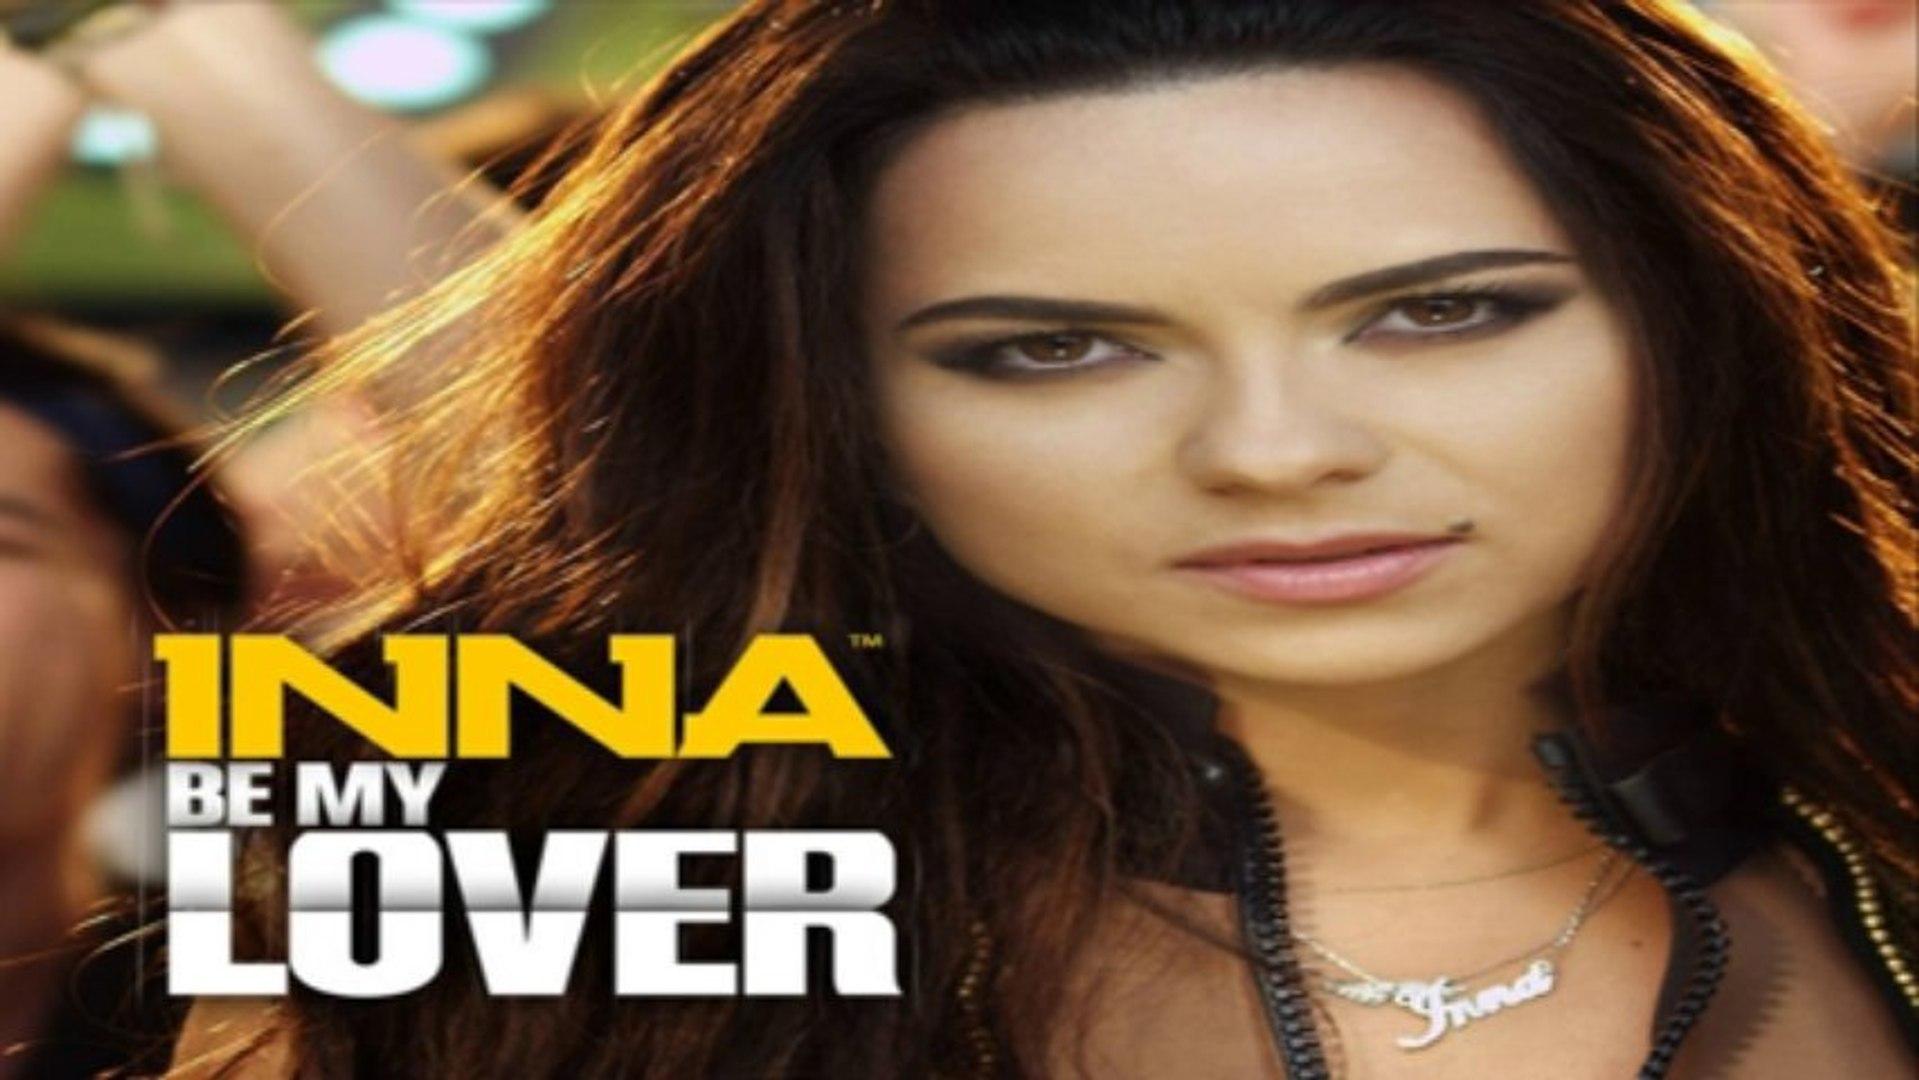 inna 2012 mp3 free download